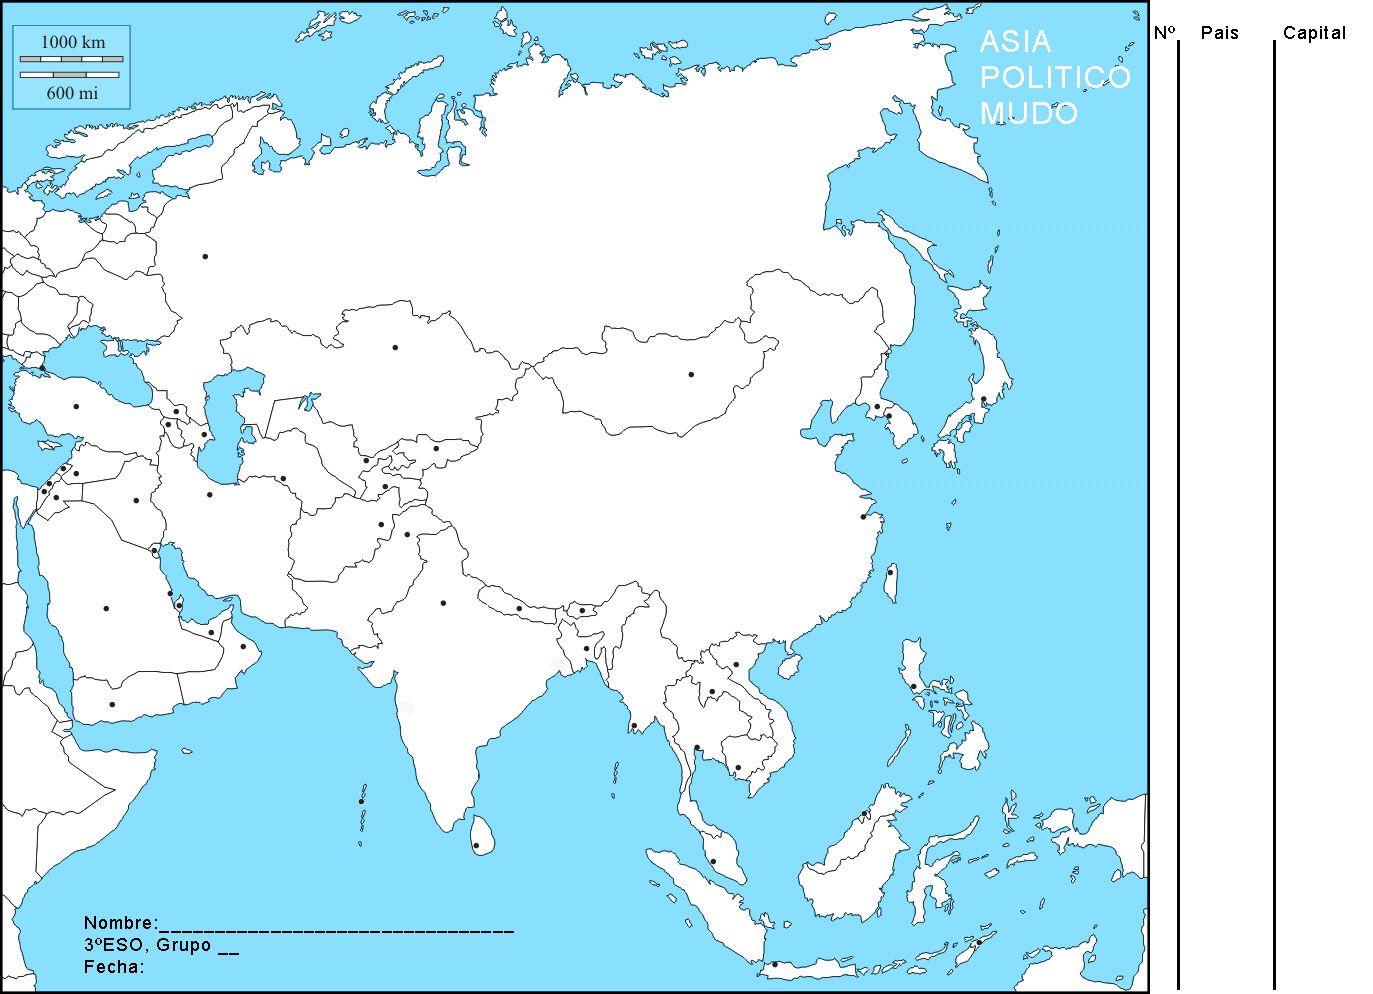 Resultado De Imagen Para Mapa Politico Asia Para Imprimir Mapa